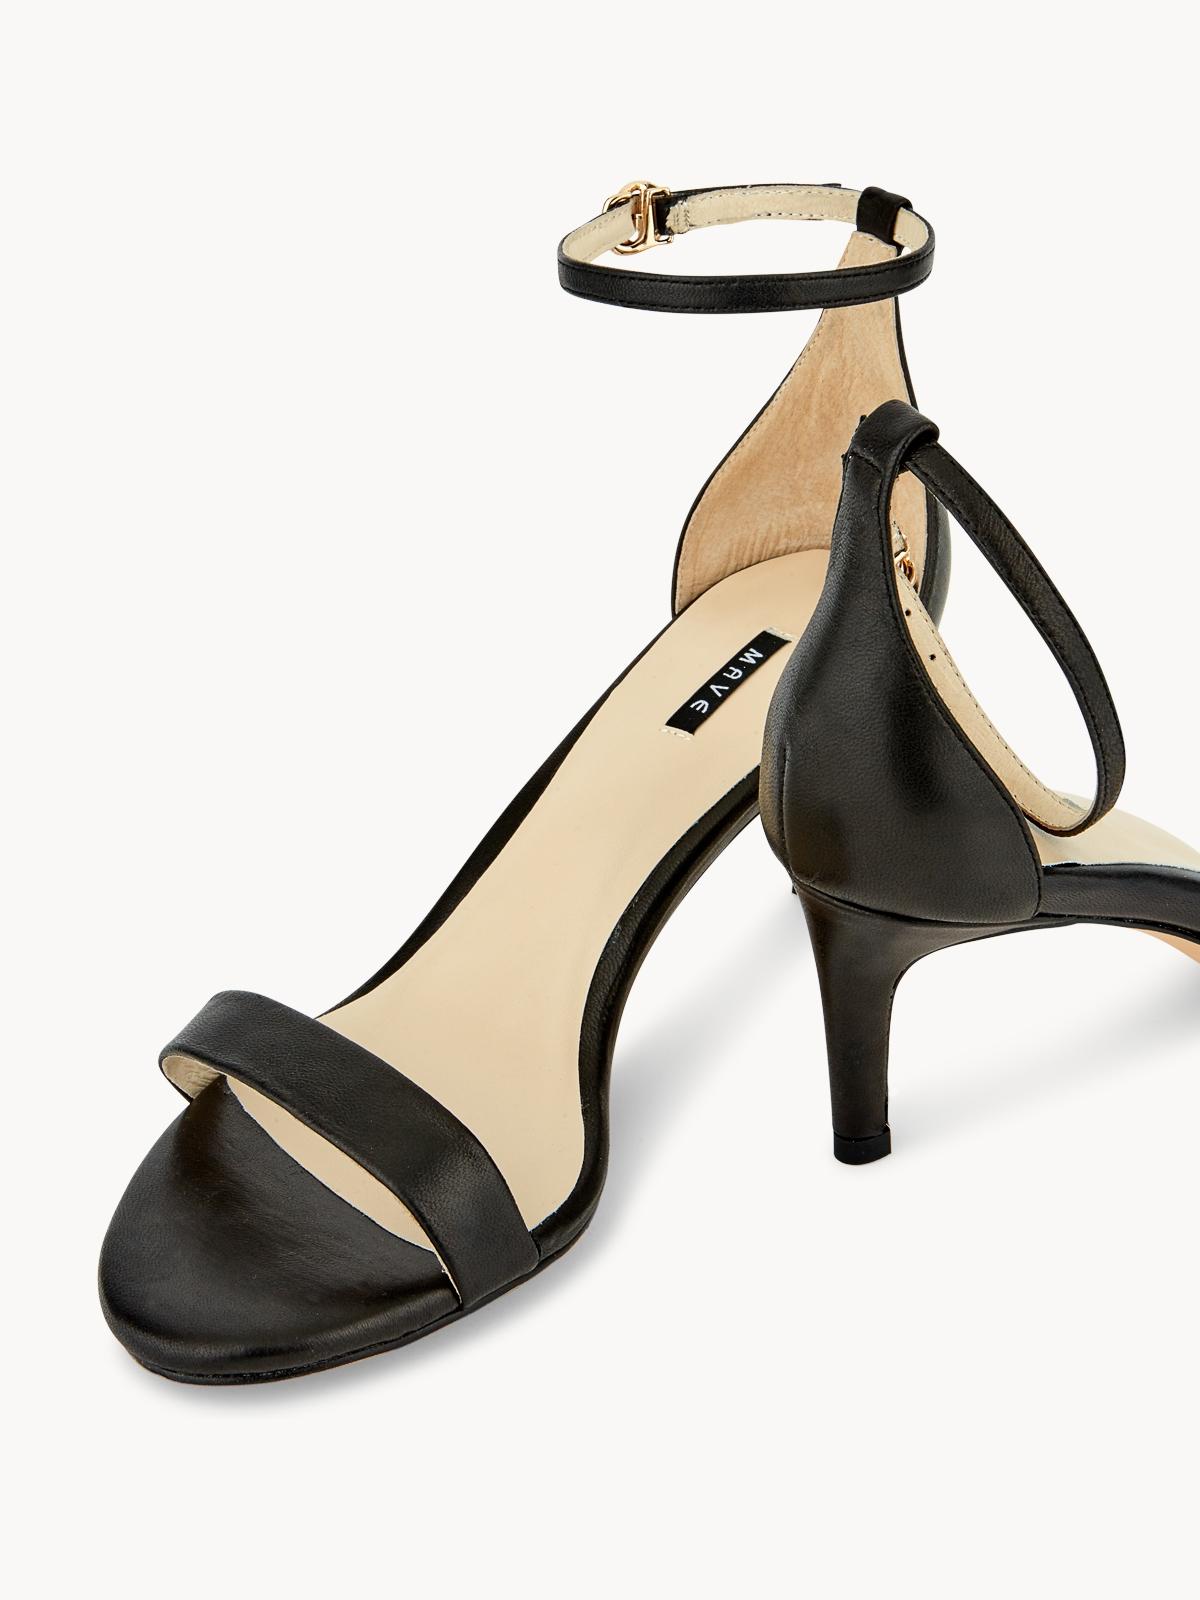 Mave Bliss Mid Heels Black